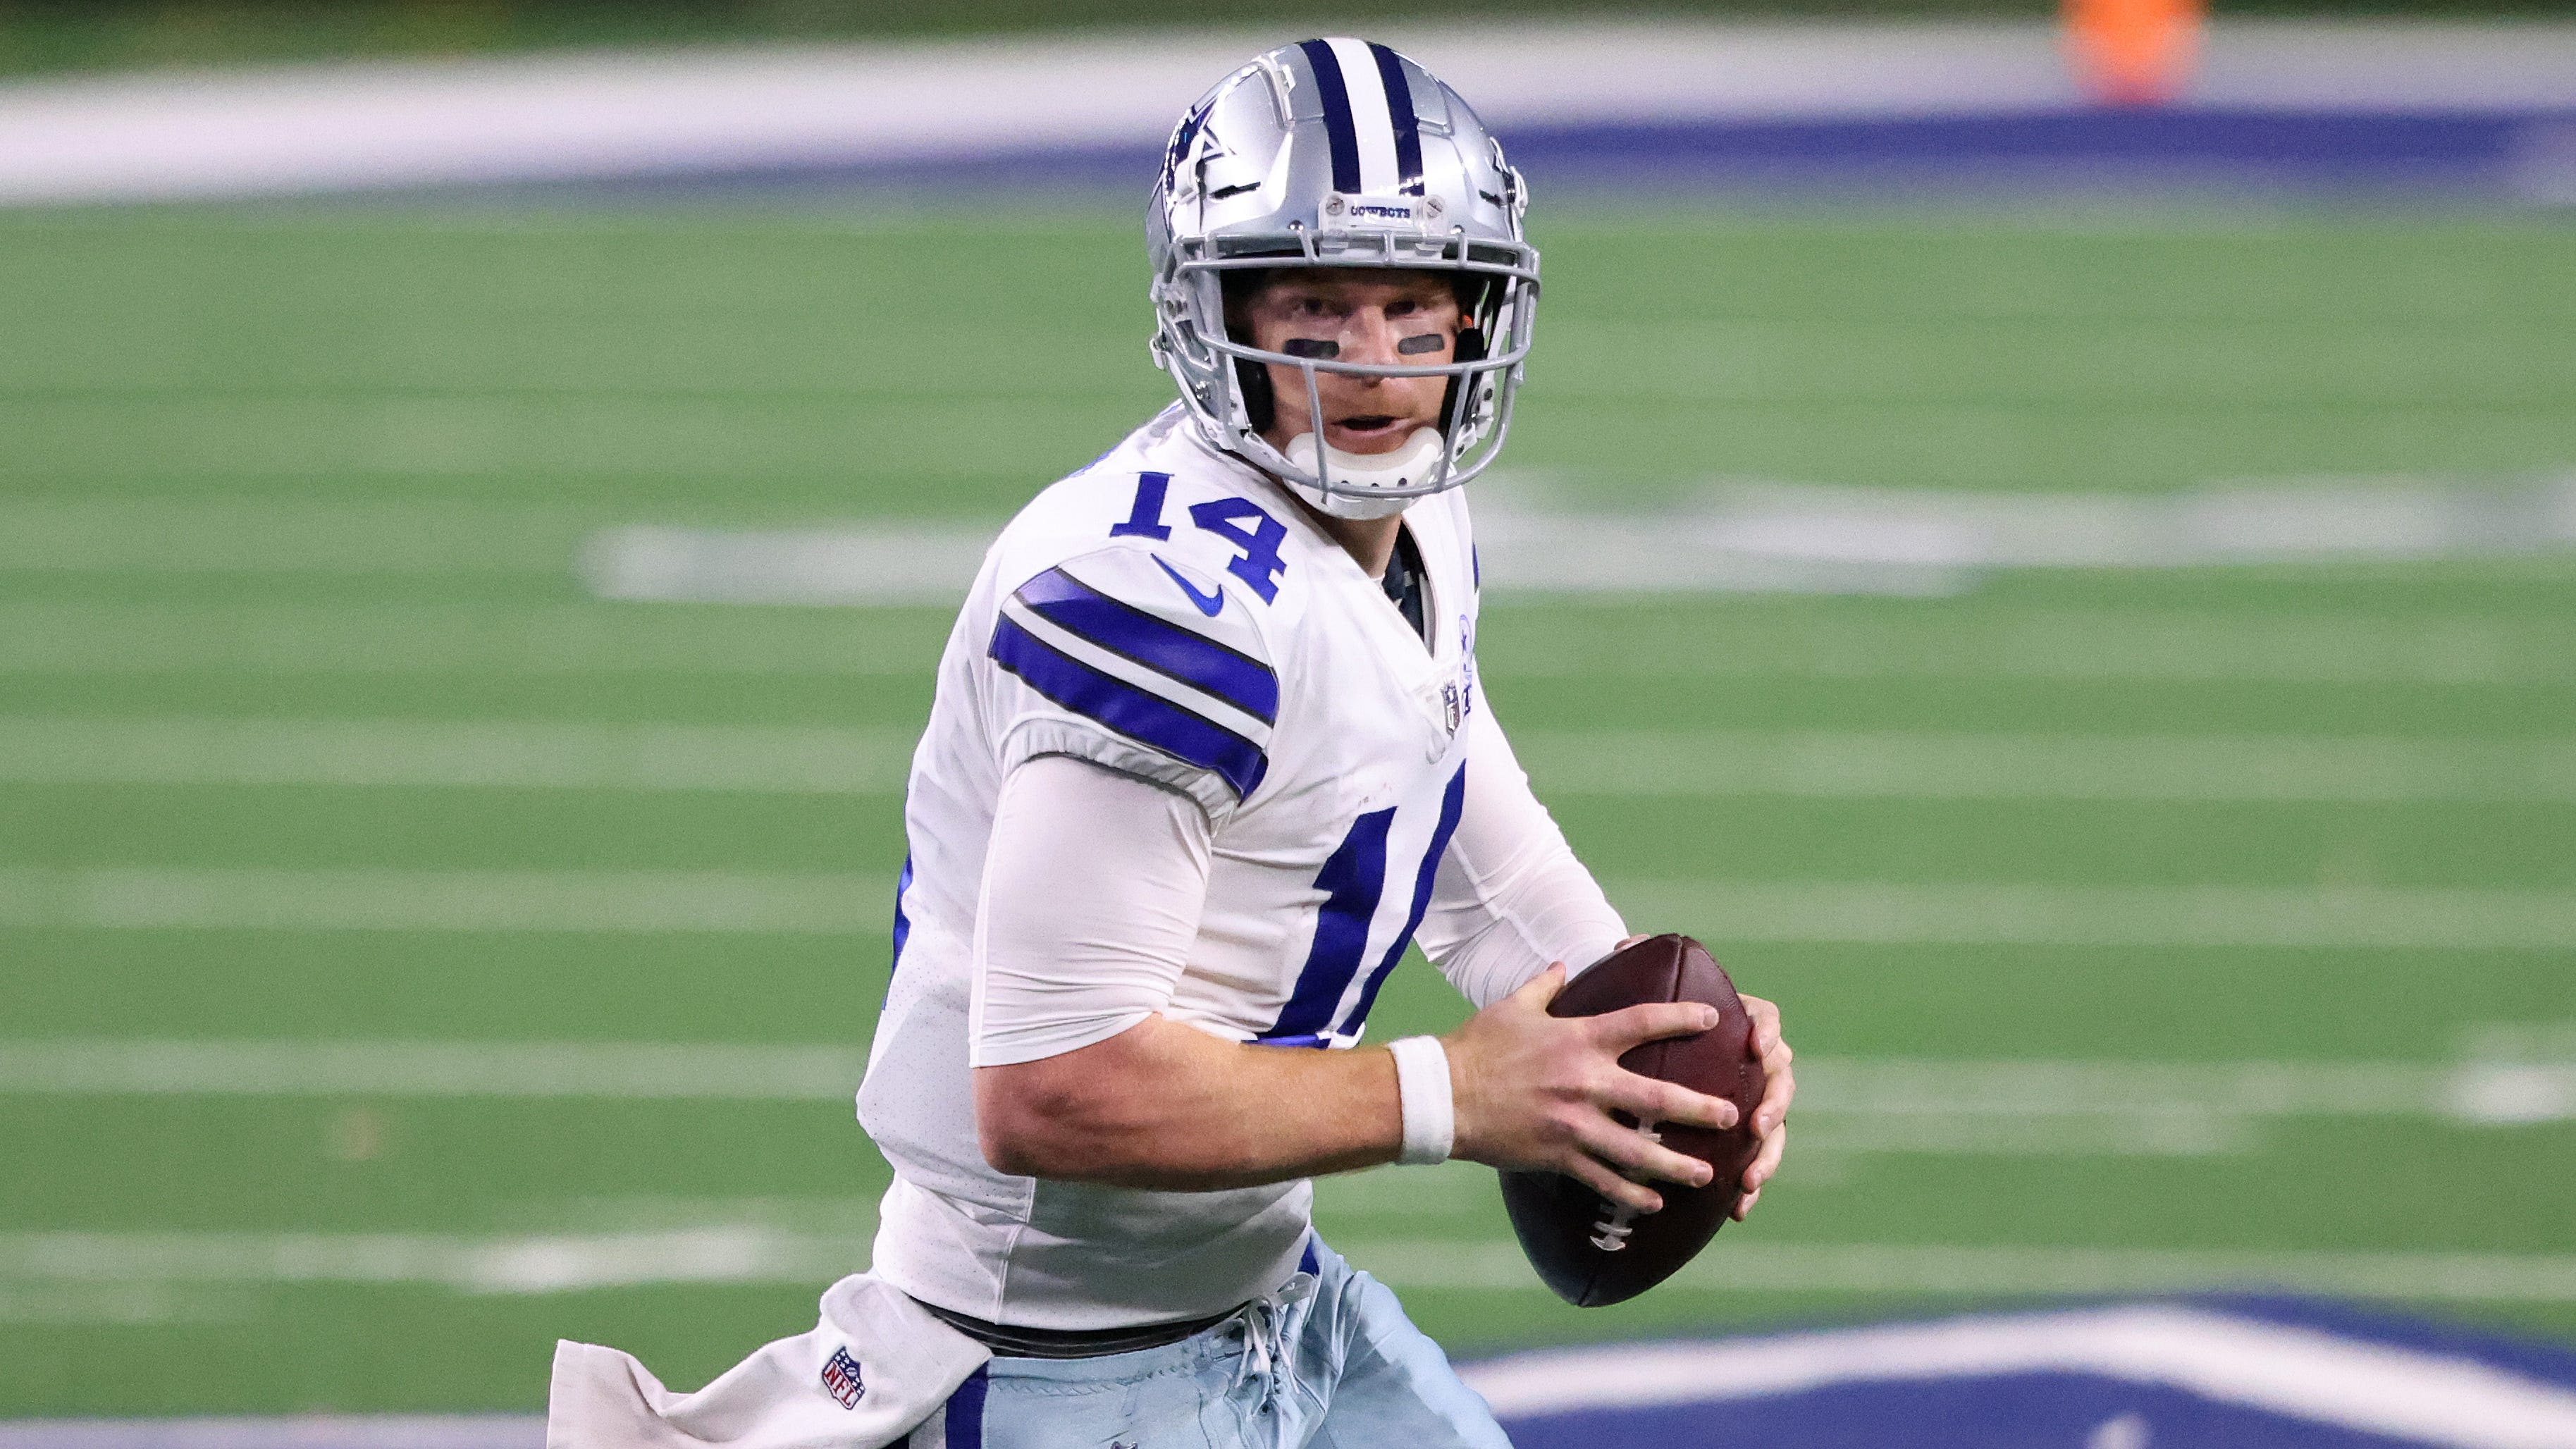 Andy Dalton #14 of the Dallas Cowboys runs against the Arizona Cardinals during the fourth quarter at AT&T Stadium on October 19, 2020, in Arlington, Texas.